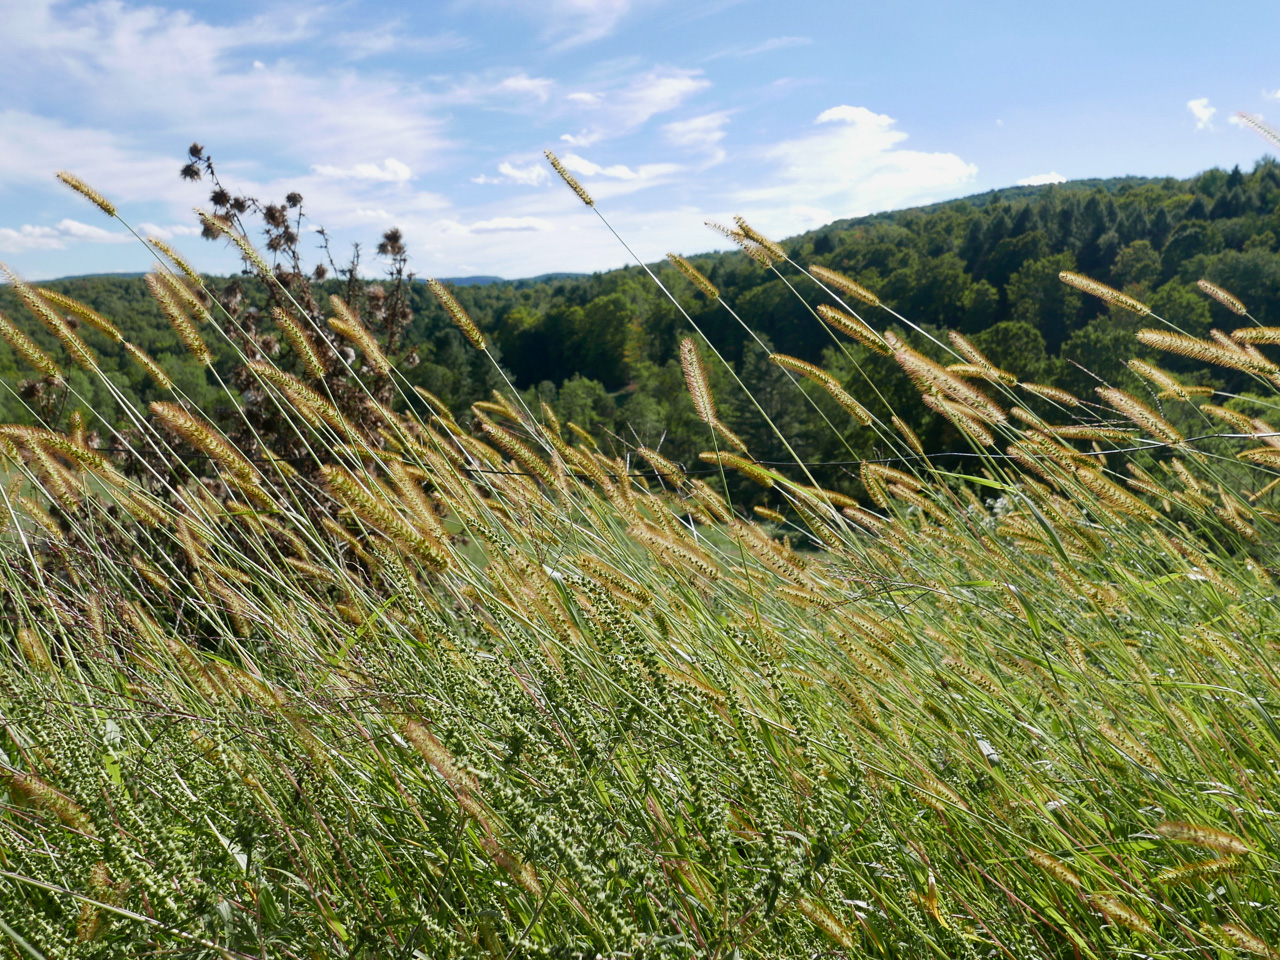 Cara Sharratt Travel - Sugarbush Farms - Woodstock, Vermont